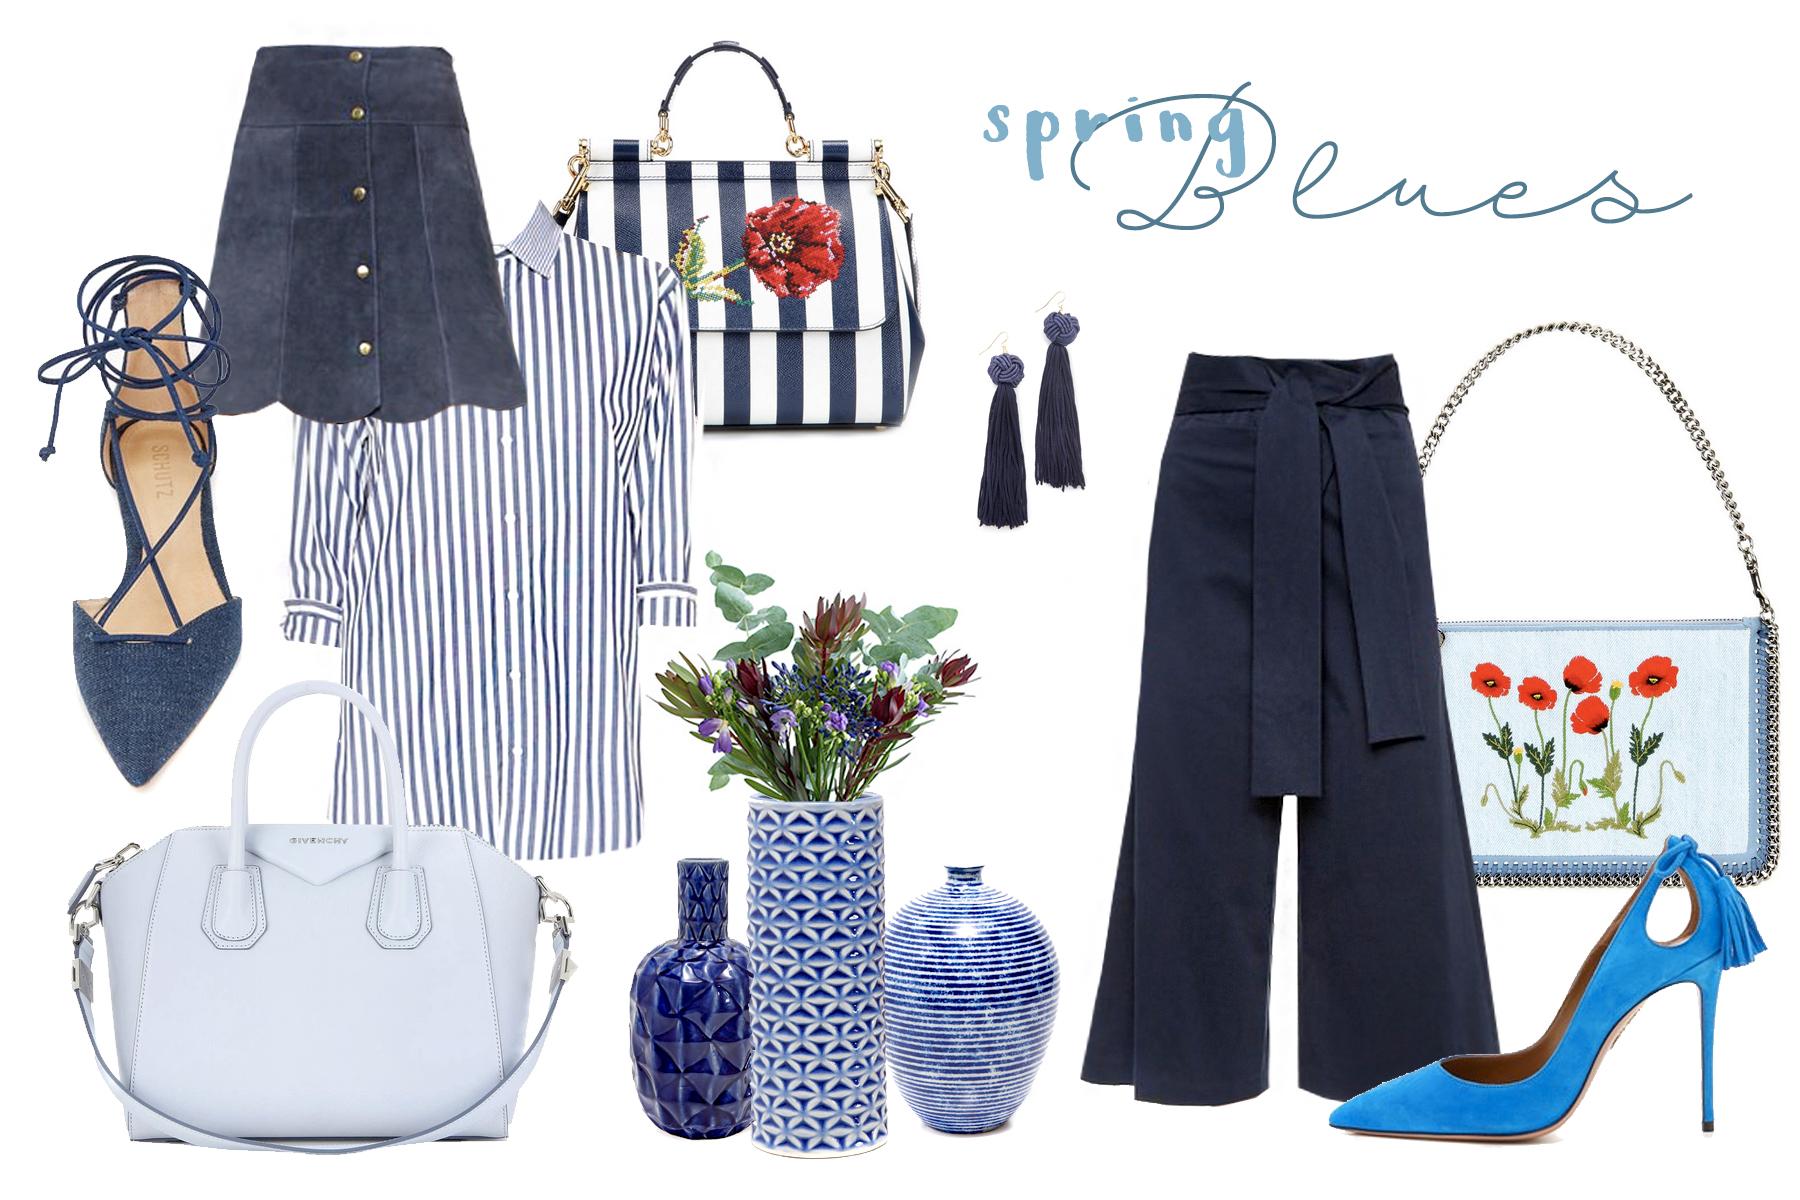 inspo inspiration board moodboard blue style fashion newin spring 2016 look lookbook handbag luxe luxury blog blogger fashionblogger germany dusseldorf berlin cats & dogs blog ricarda schernus 1